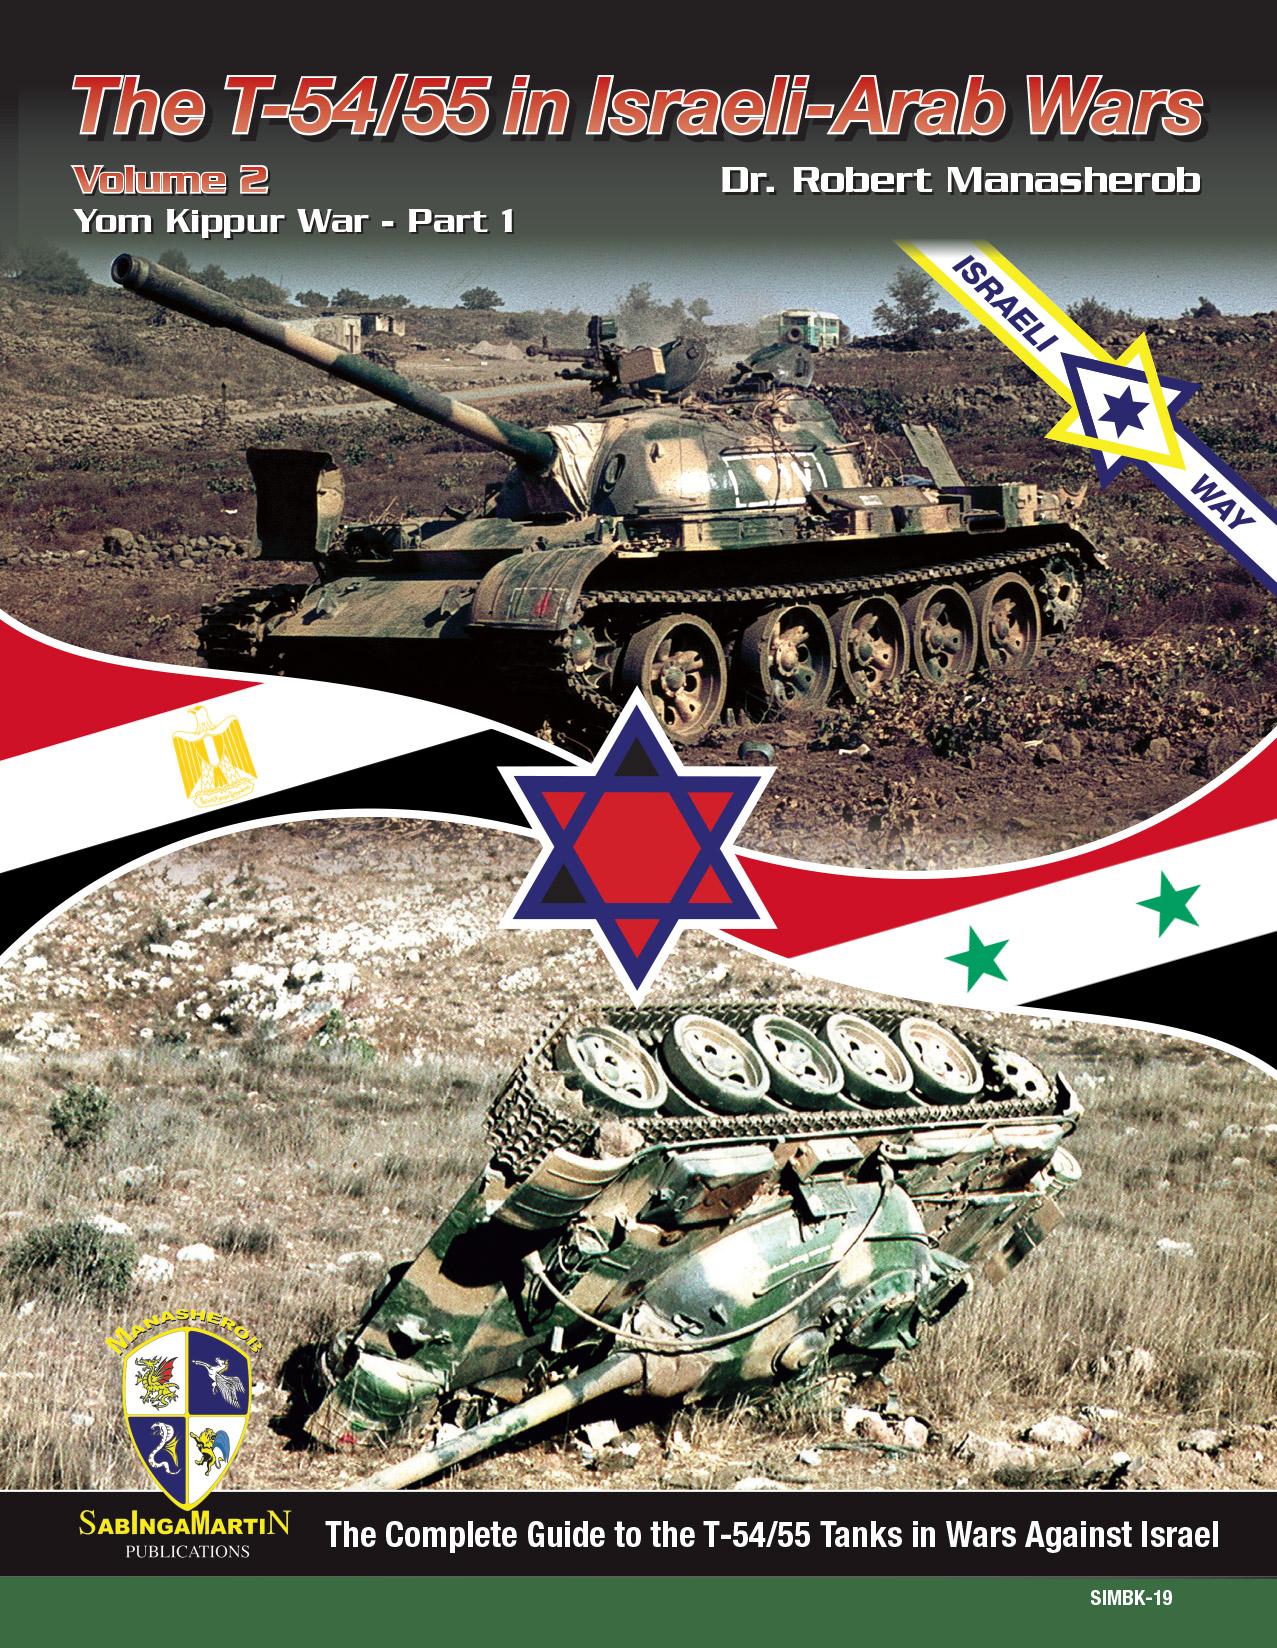 T-55-In-the-Arab-Israeli-Wars-Vol-2-Outside-Cover_01.jpg